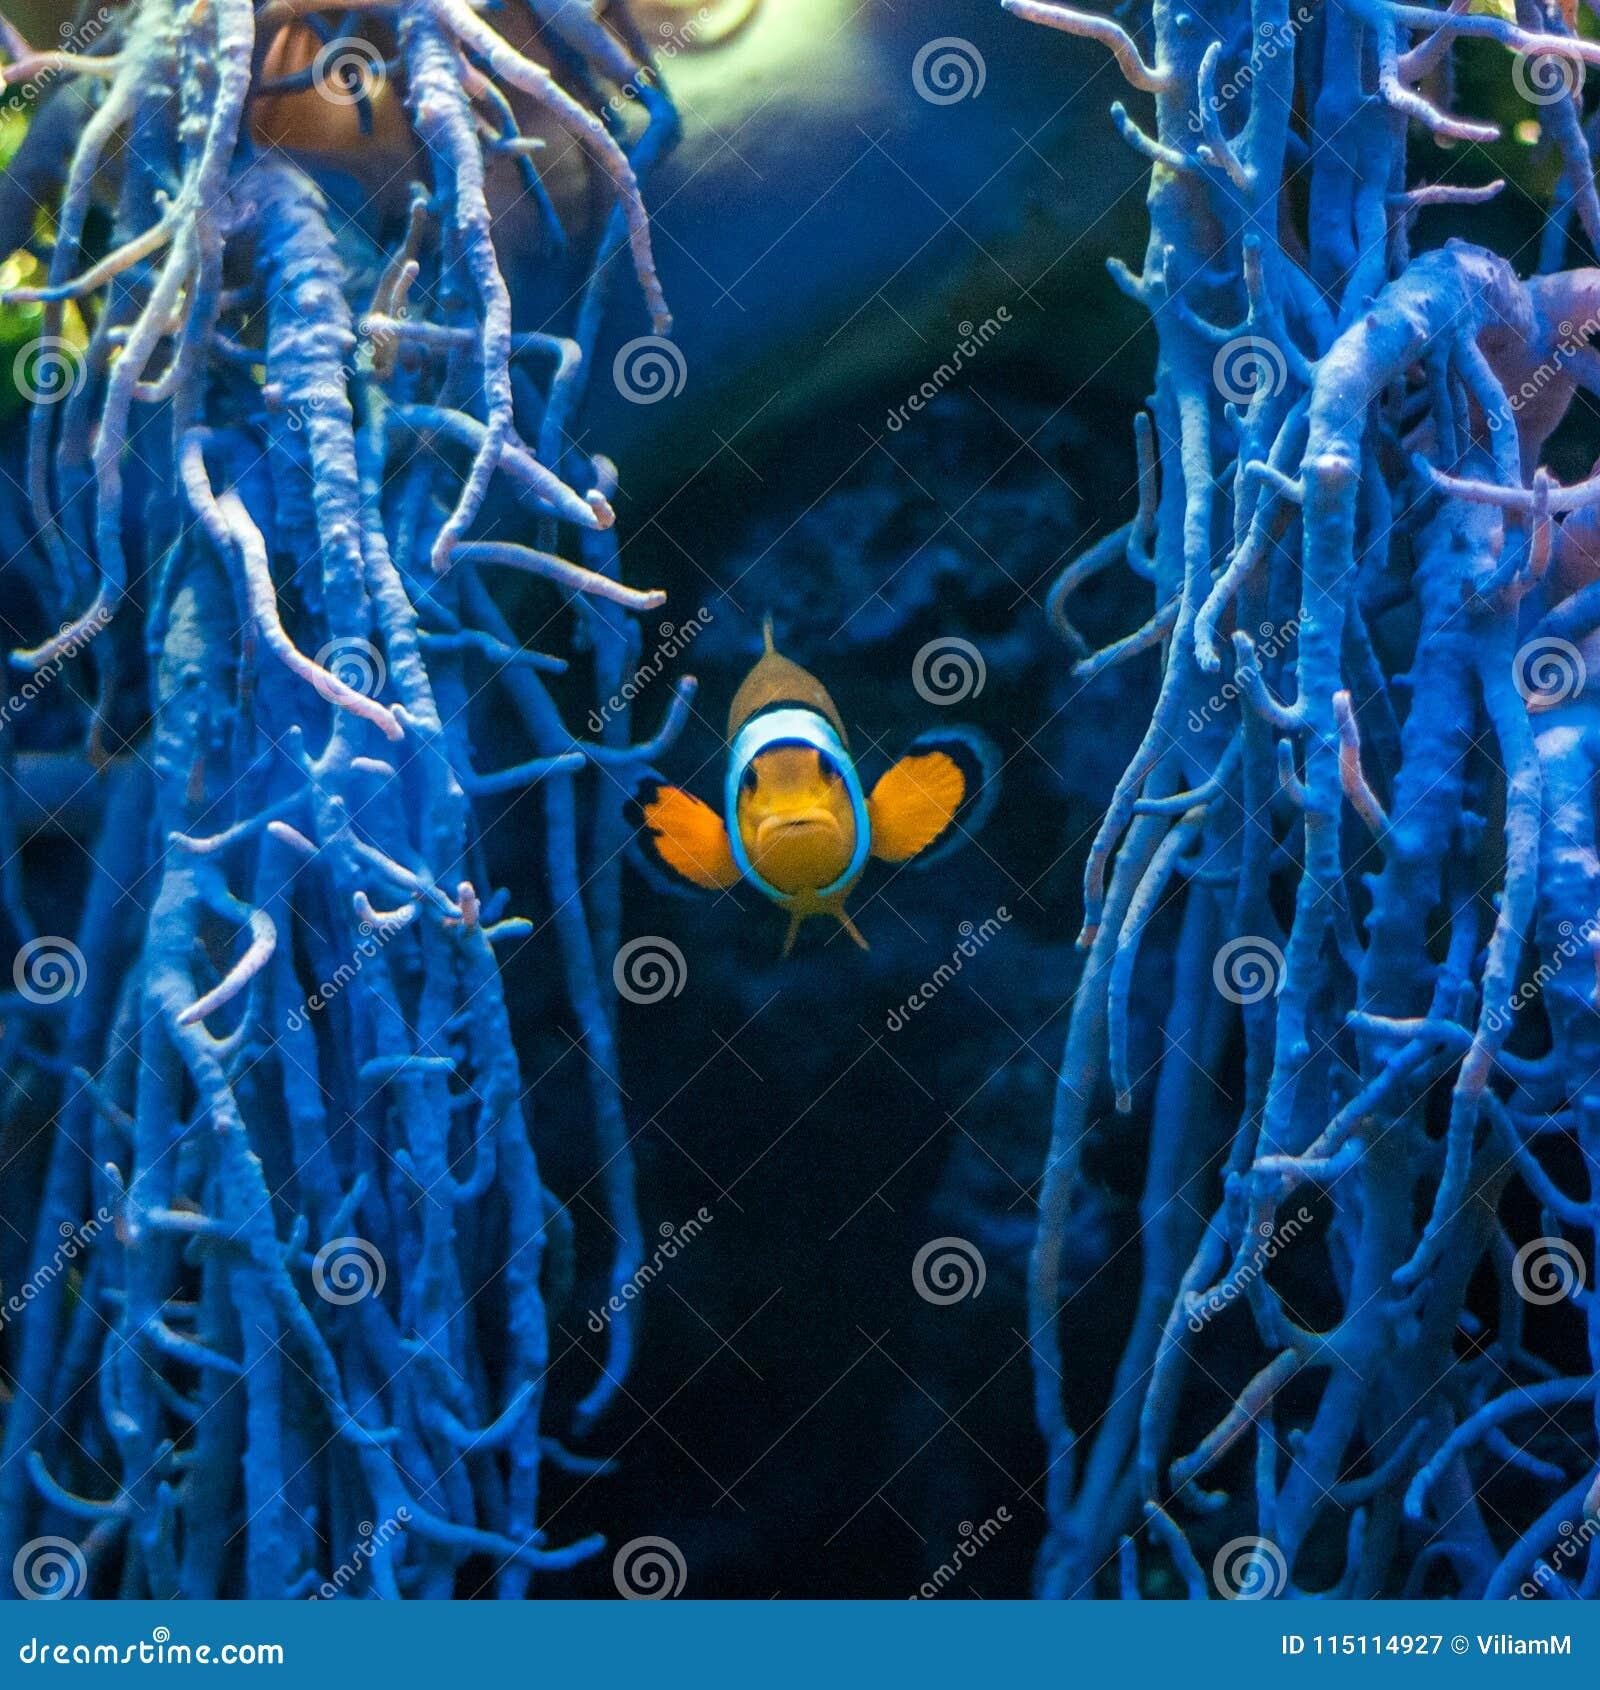 Famous Aquarium Fish The Ocellaris Clownfish Stock Image Image Of